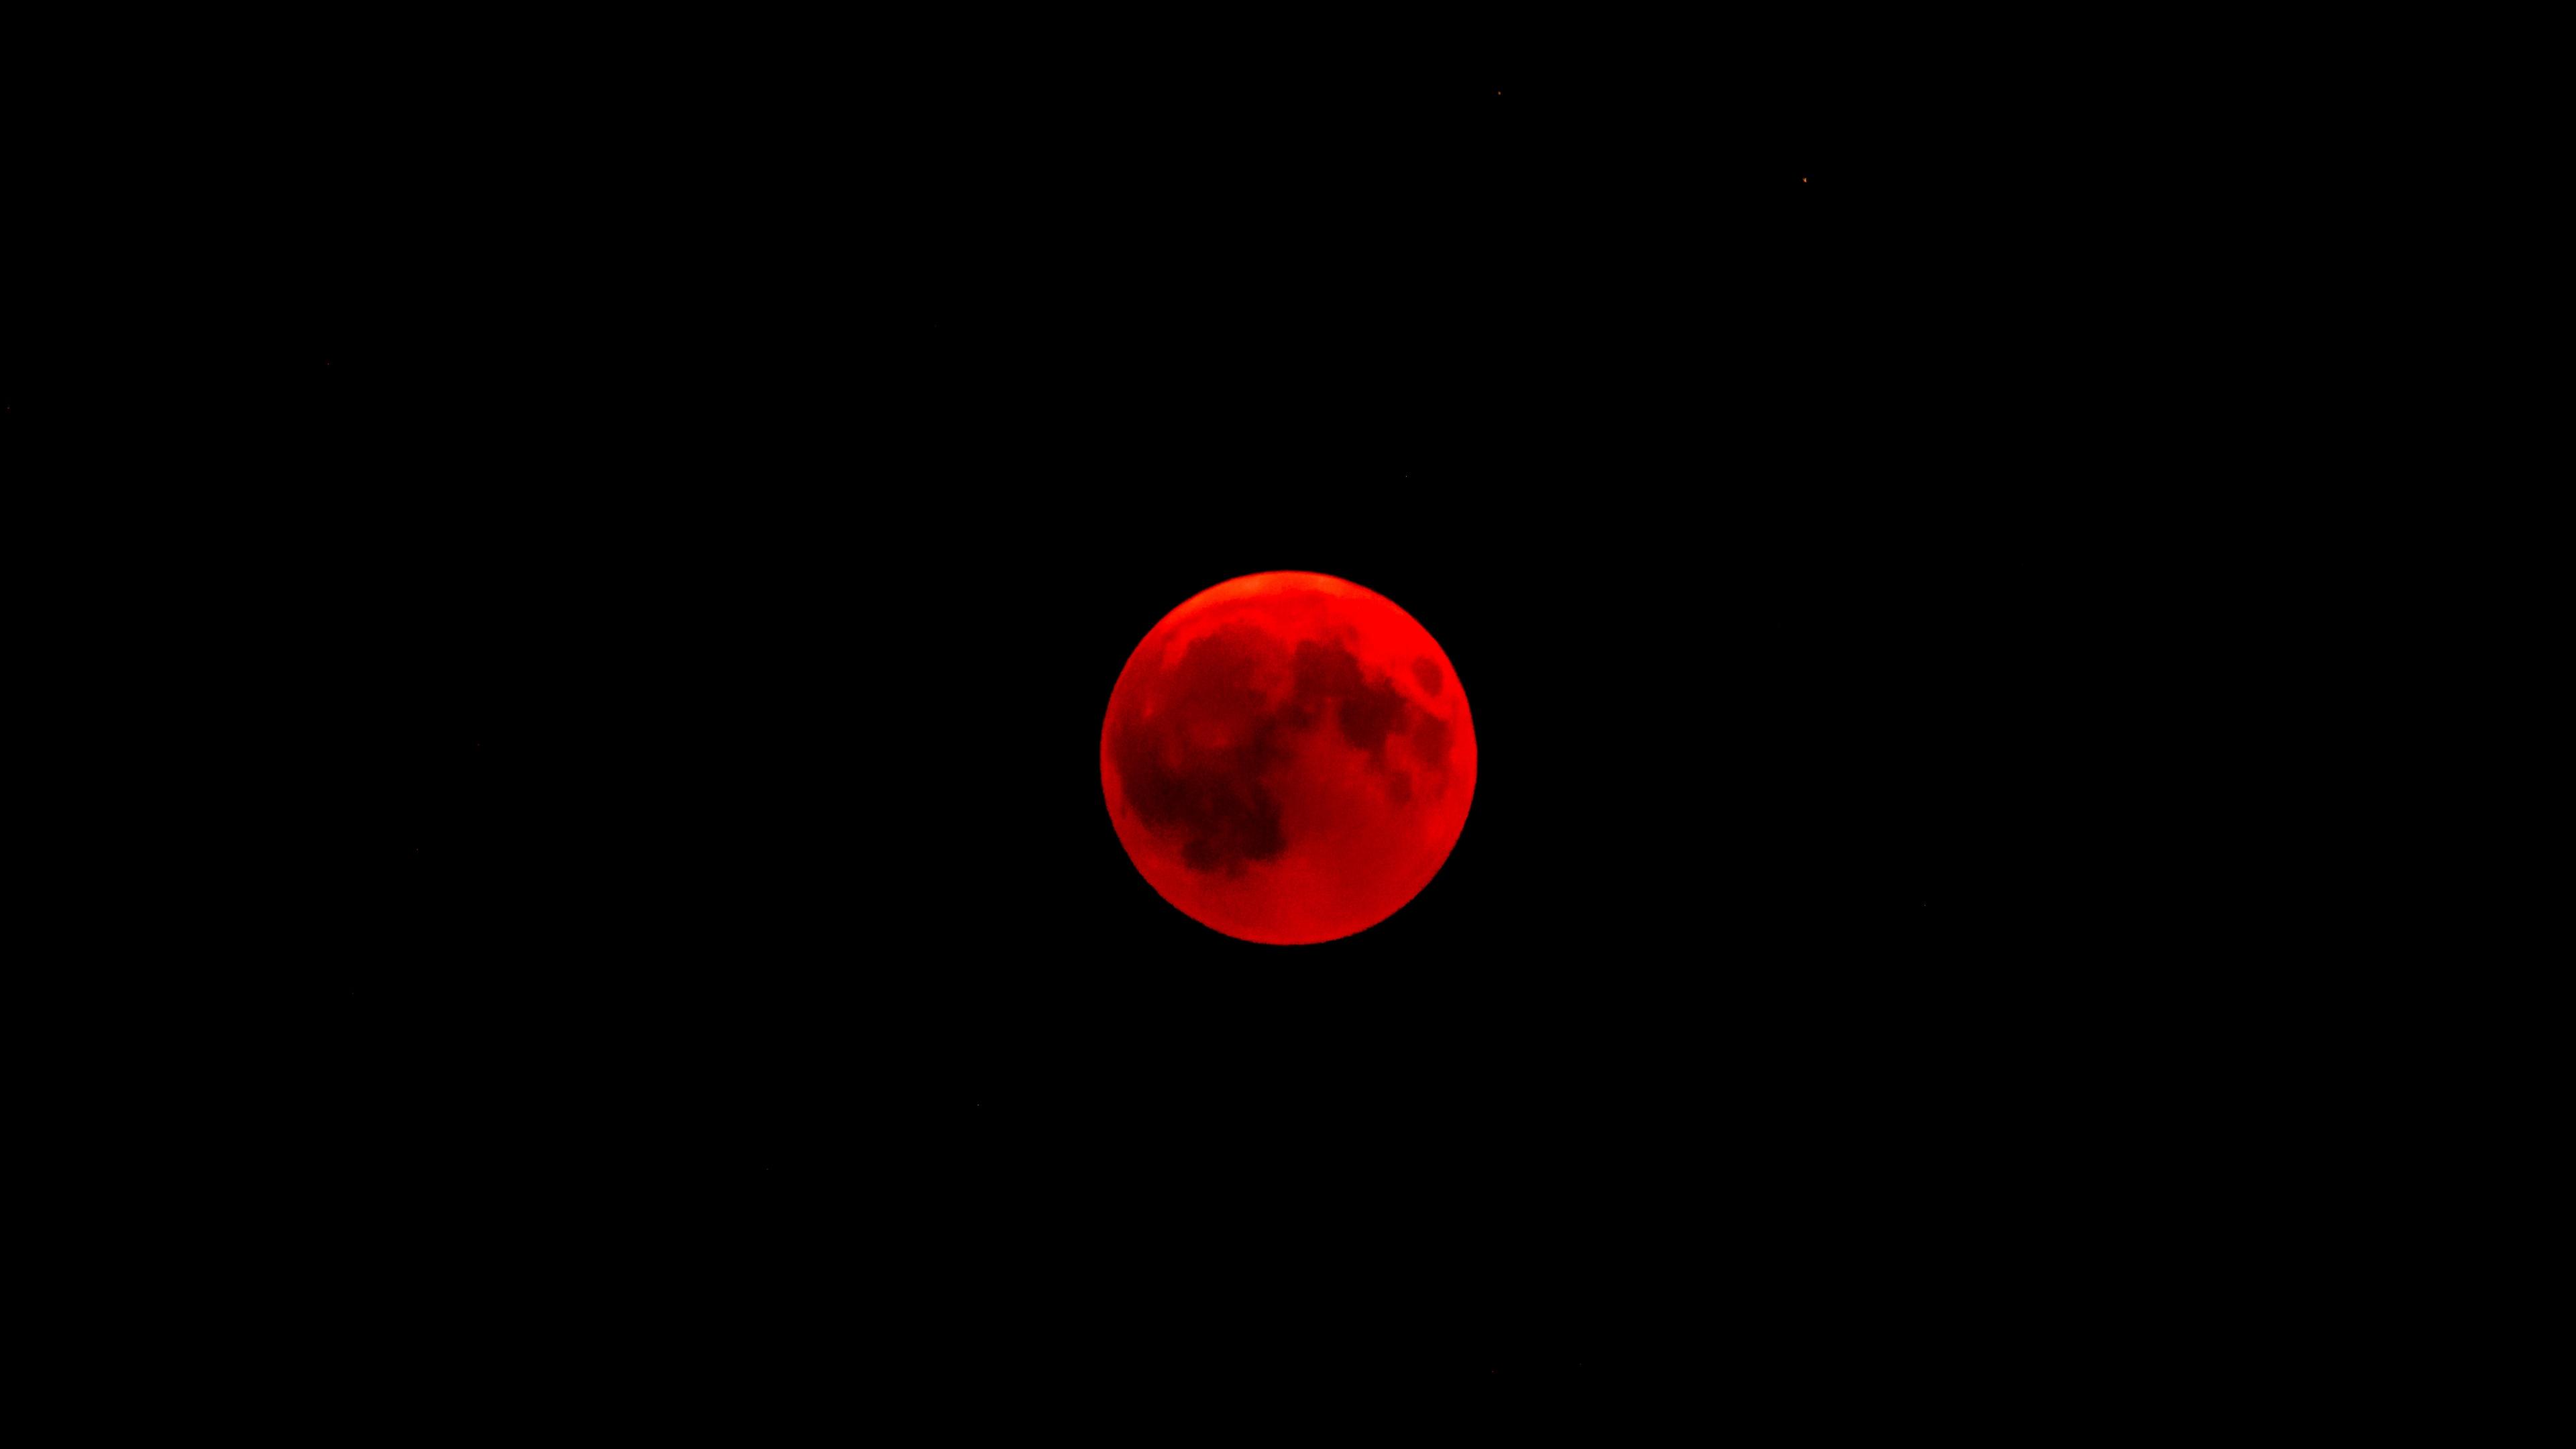 moon full moon eclipse red moon 4k 1536016618 - moon, full moon, eclipse, red moon 4k - Moon, full moon, Eclipse